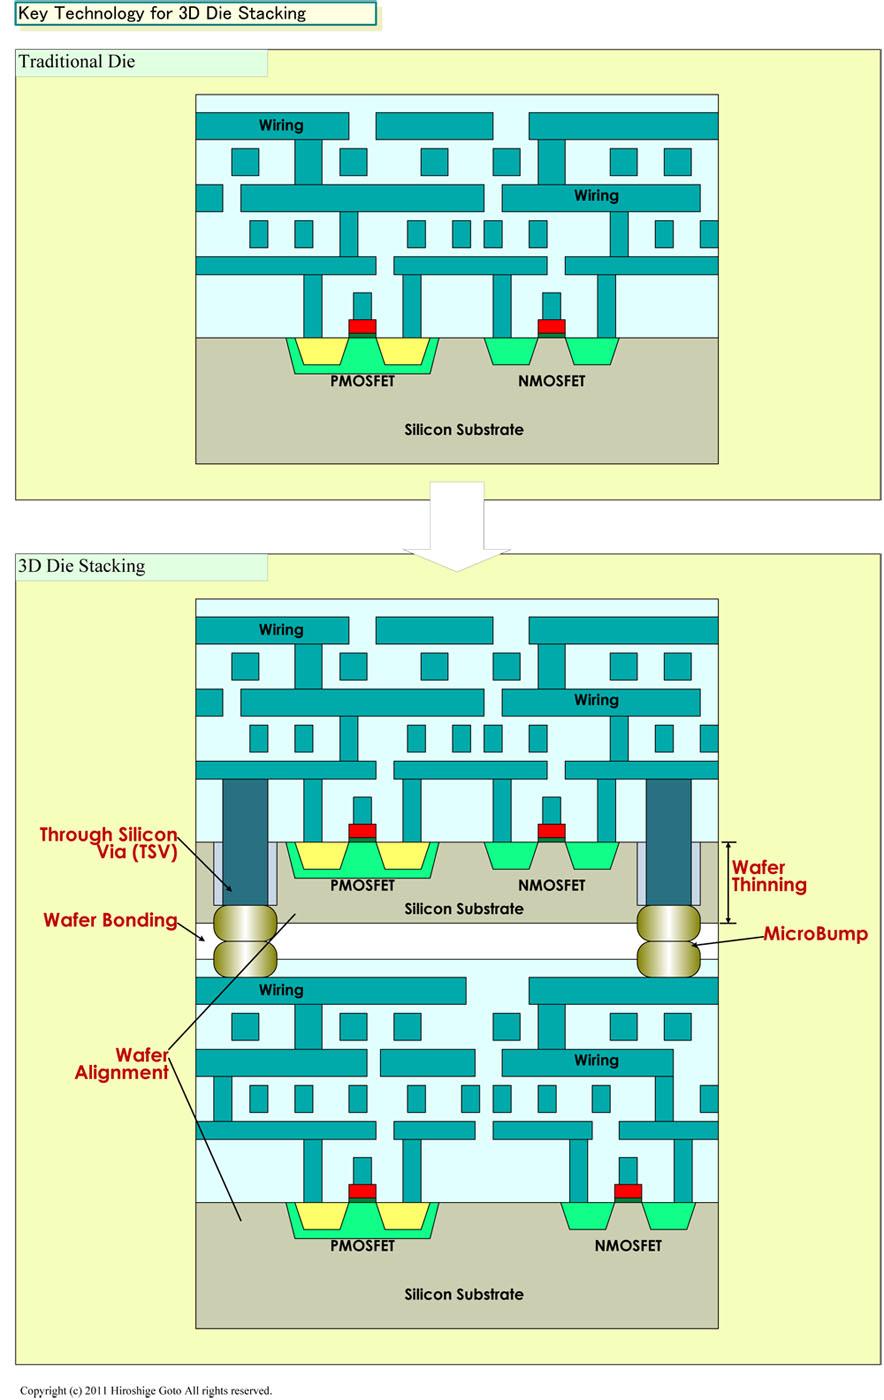 TSVの基本技術(PDF版はこちら)